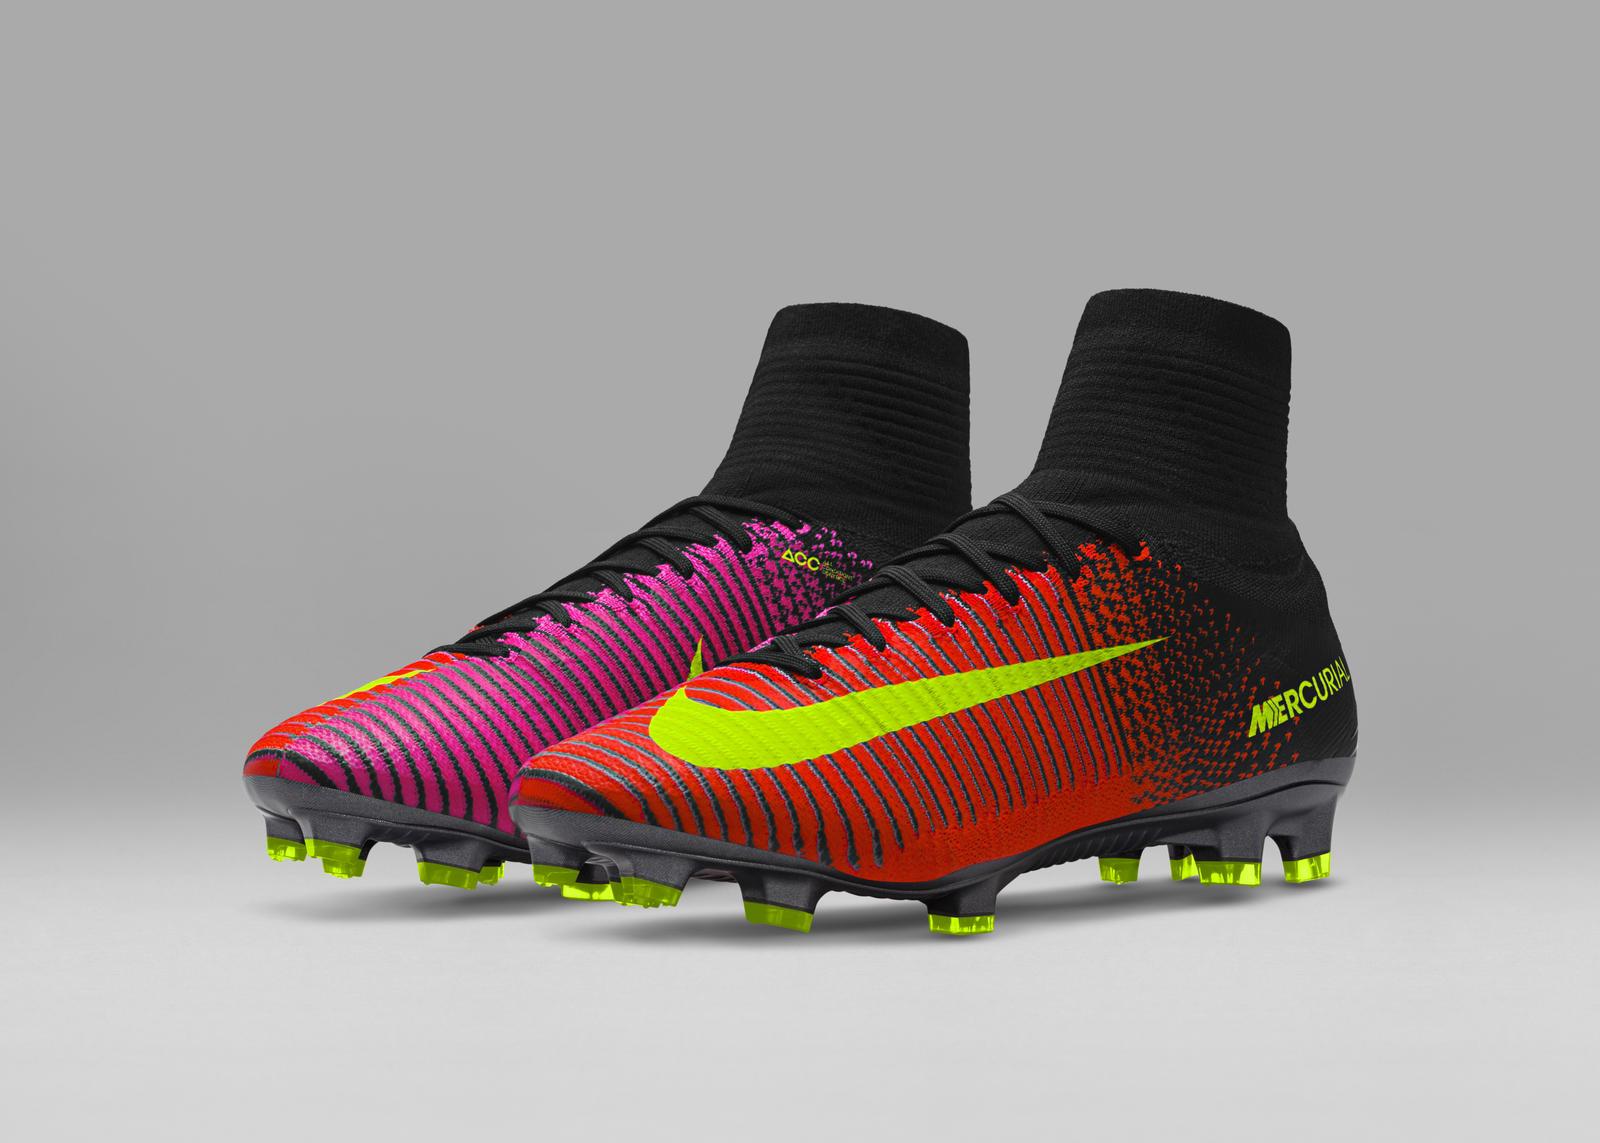 831940-870_E Nike Spark Brillaince Mercurial with sock